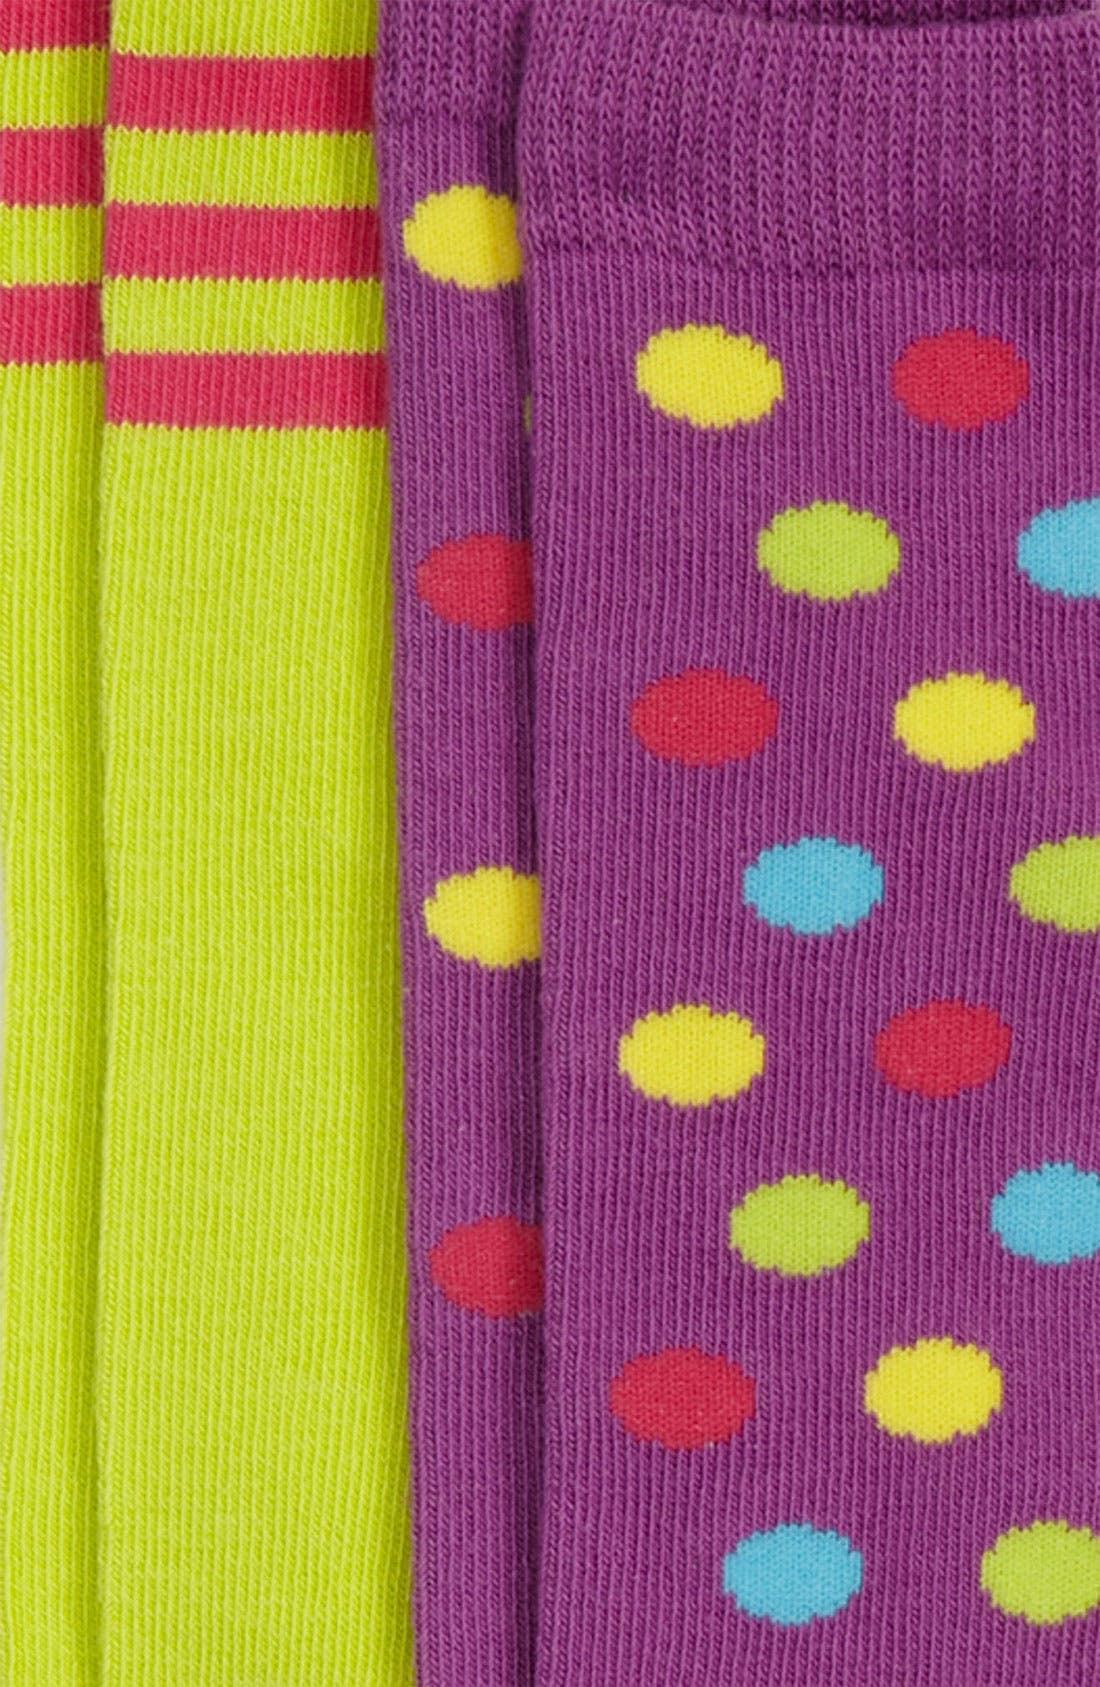 Alternate Image 2  - Nordstrom 'Mix & Match' Knee Socks (2-Pack) (Girls)